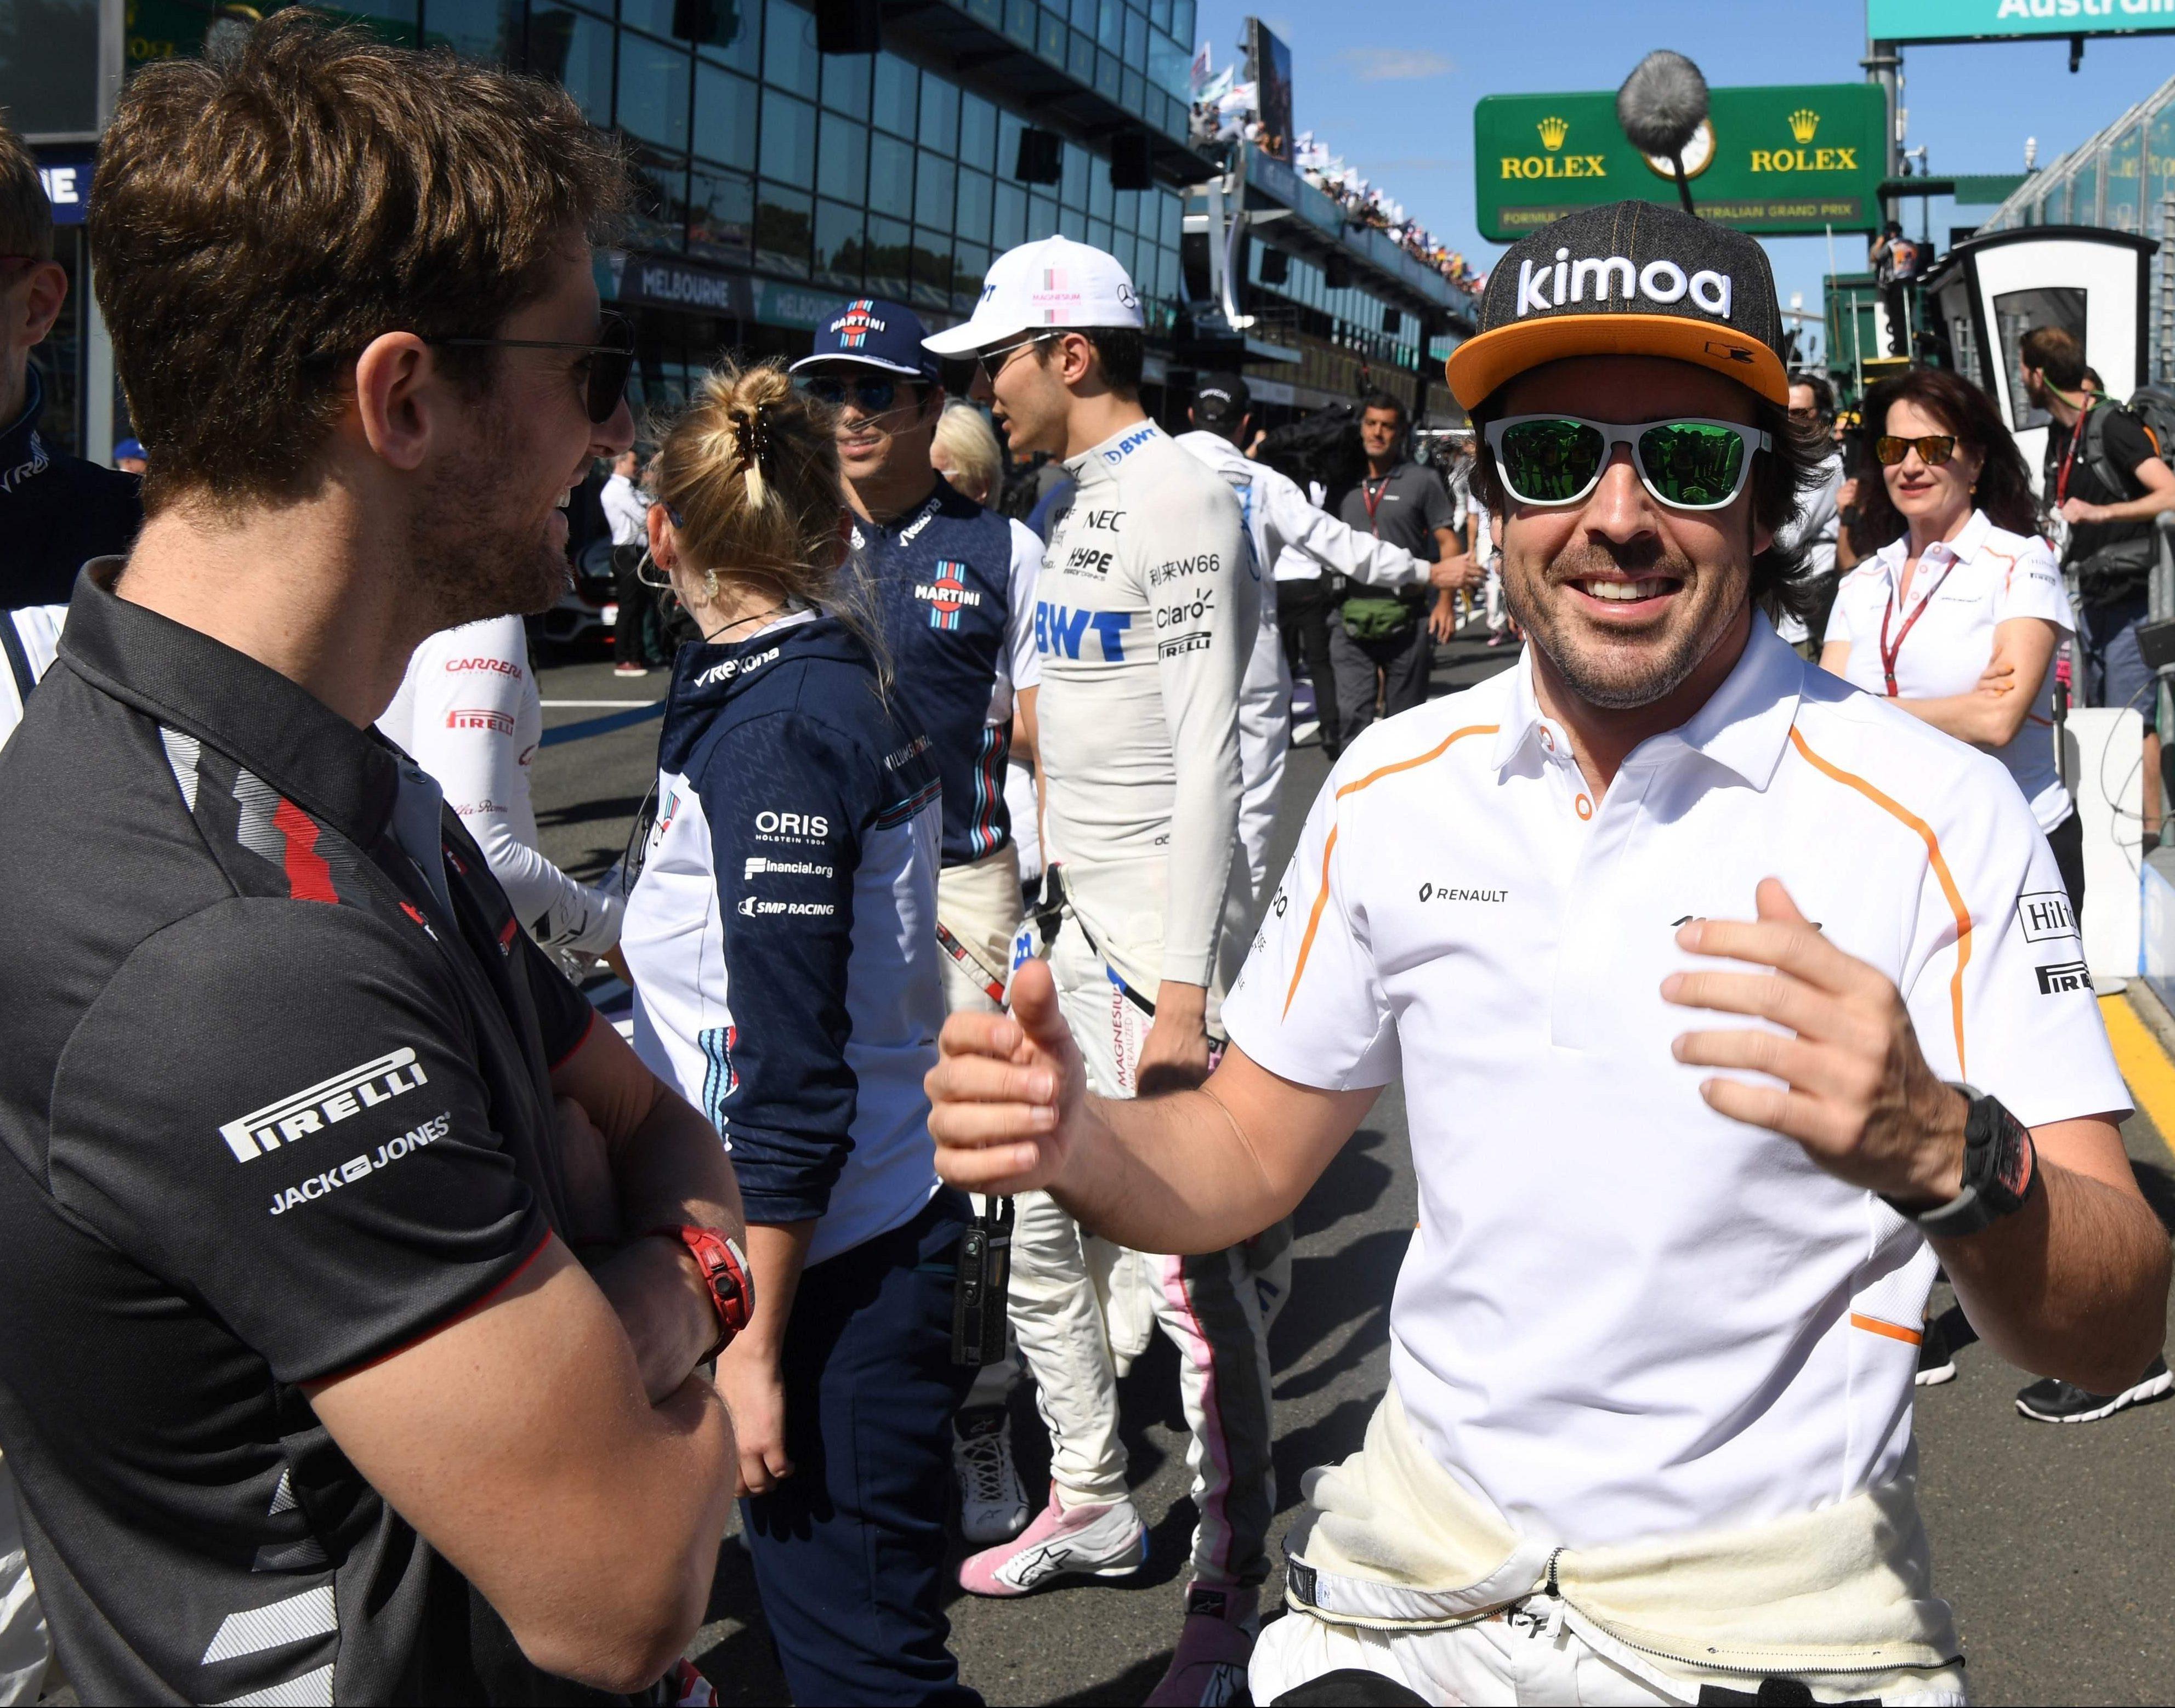 Grosjean chats to Fernando Alonso, who has labelled the 2018 Haas car a 'Ferrari replica'